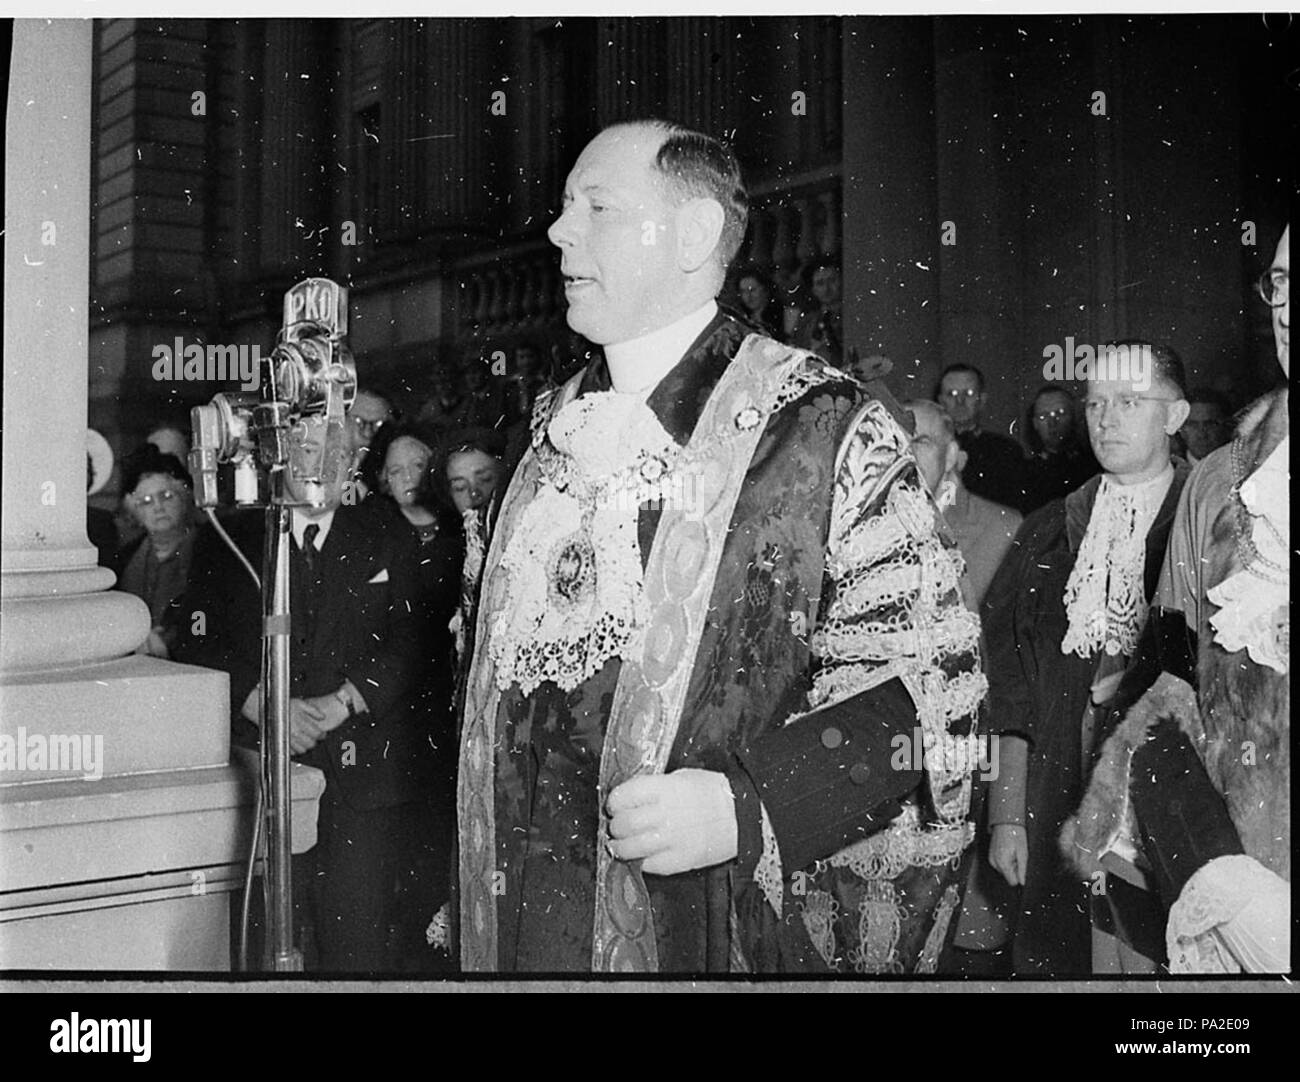 264 SLNSW 41552 Lord Mayor of London in Newcastle - Stock Image